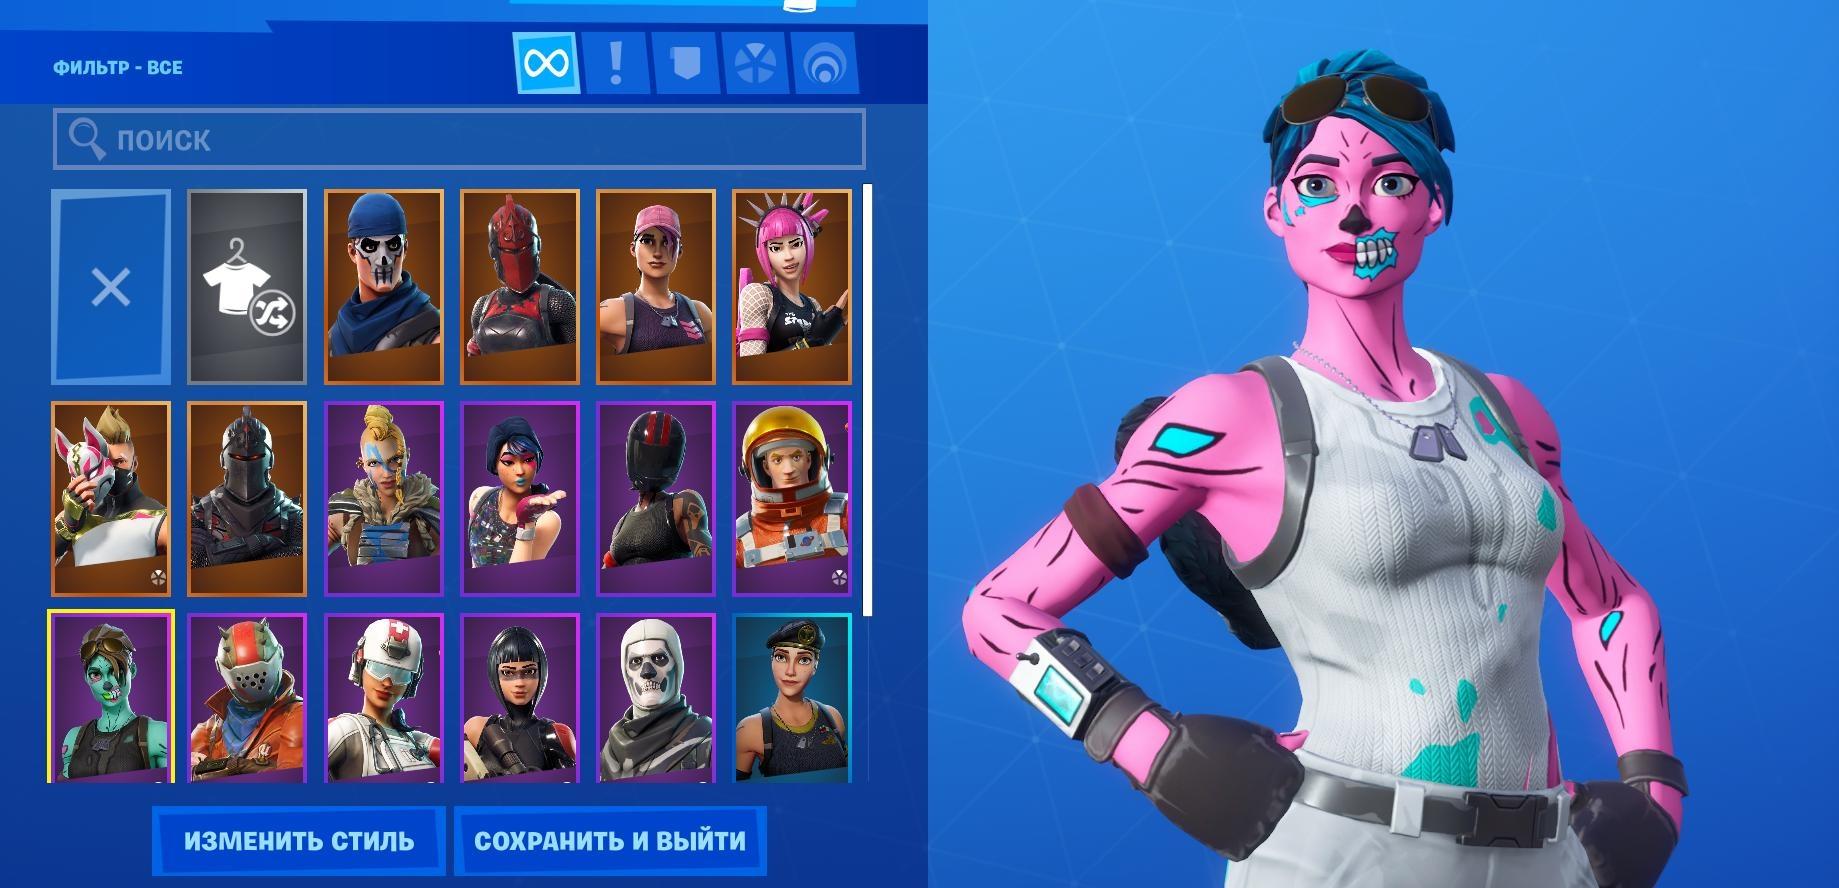 Купить 21 скин | OG Ghoul Trooper + OG Skull Trooper + Renegade Raider